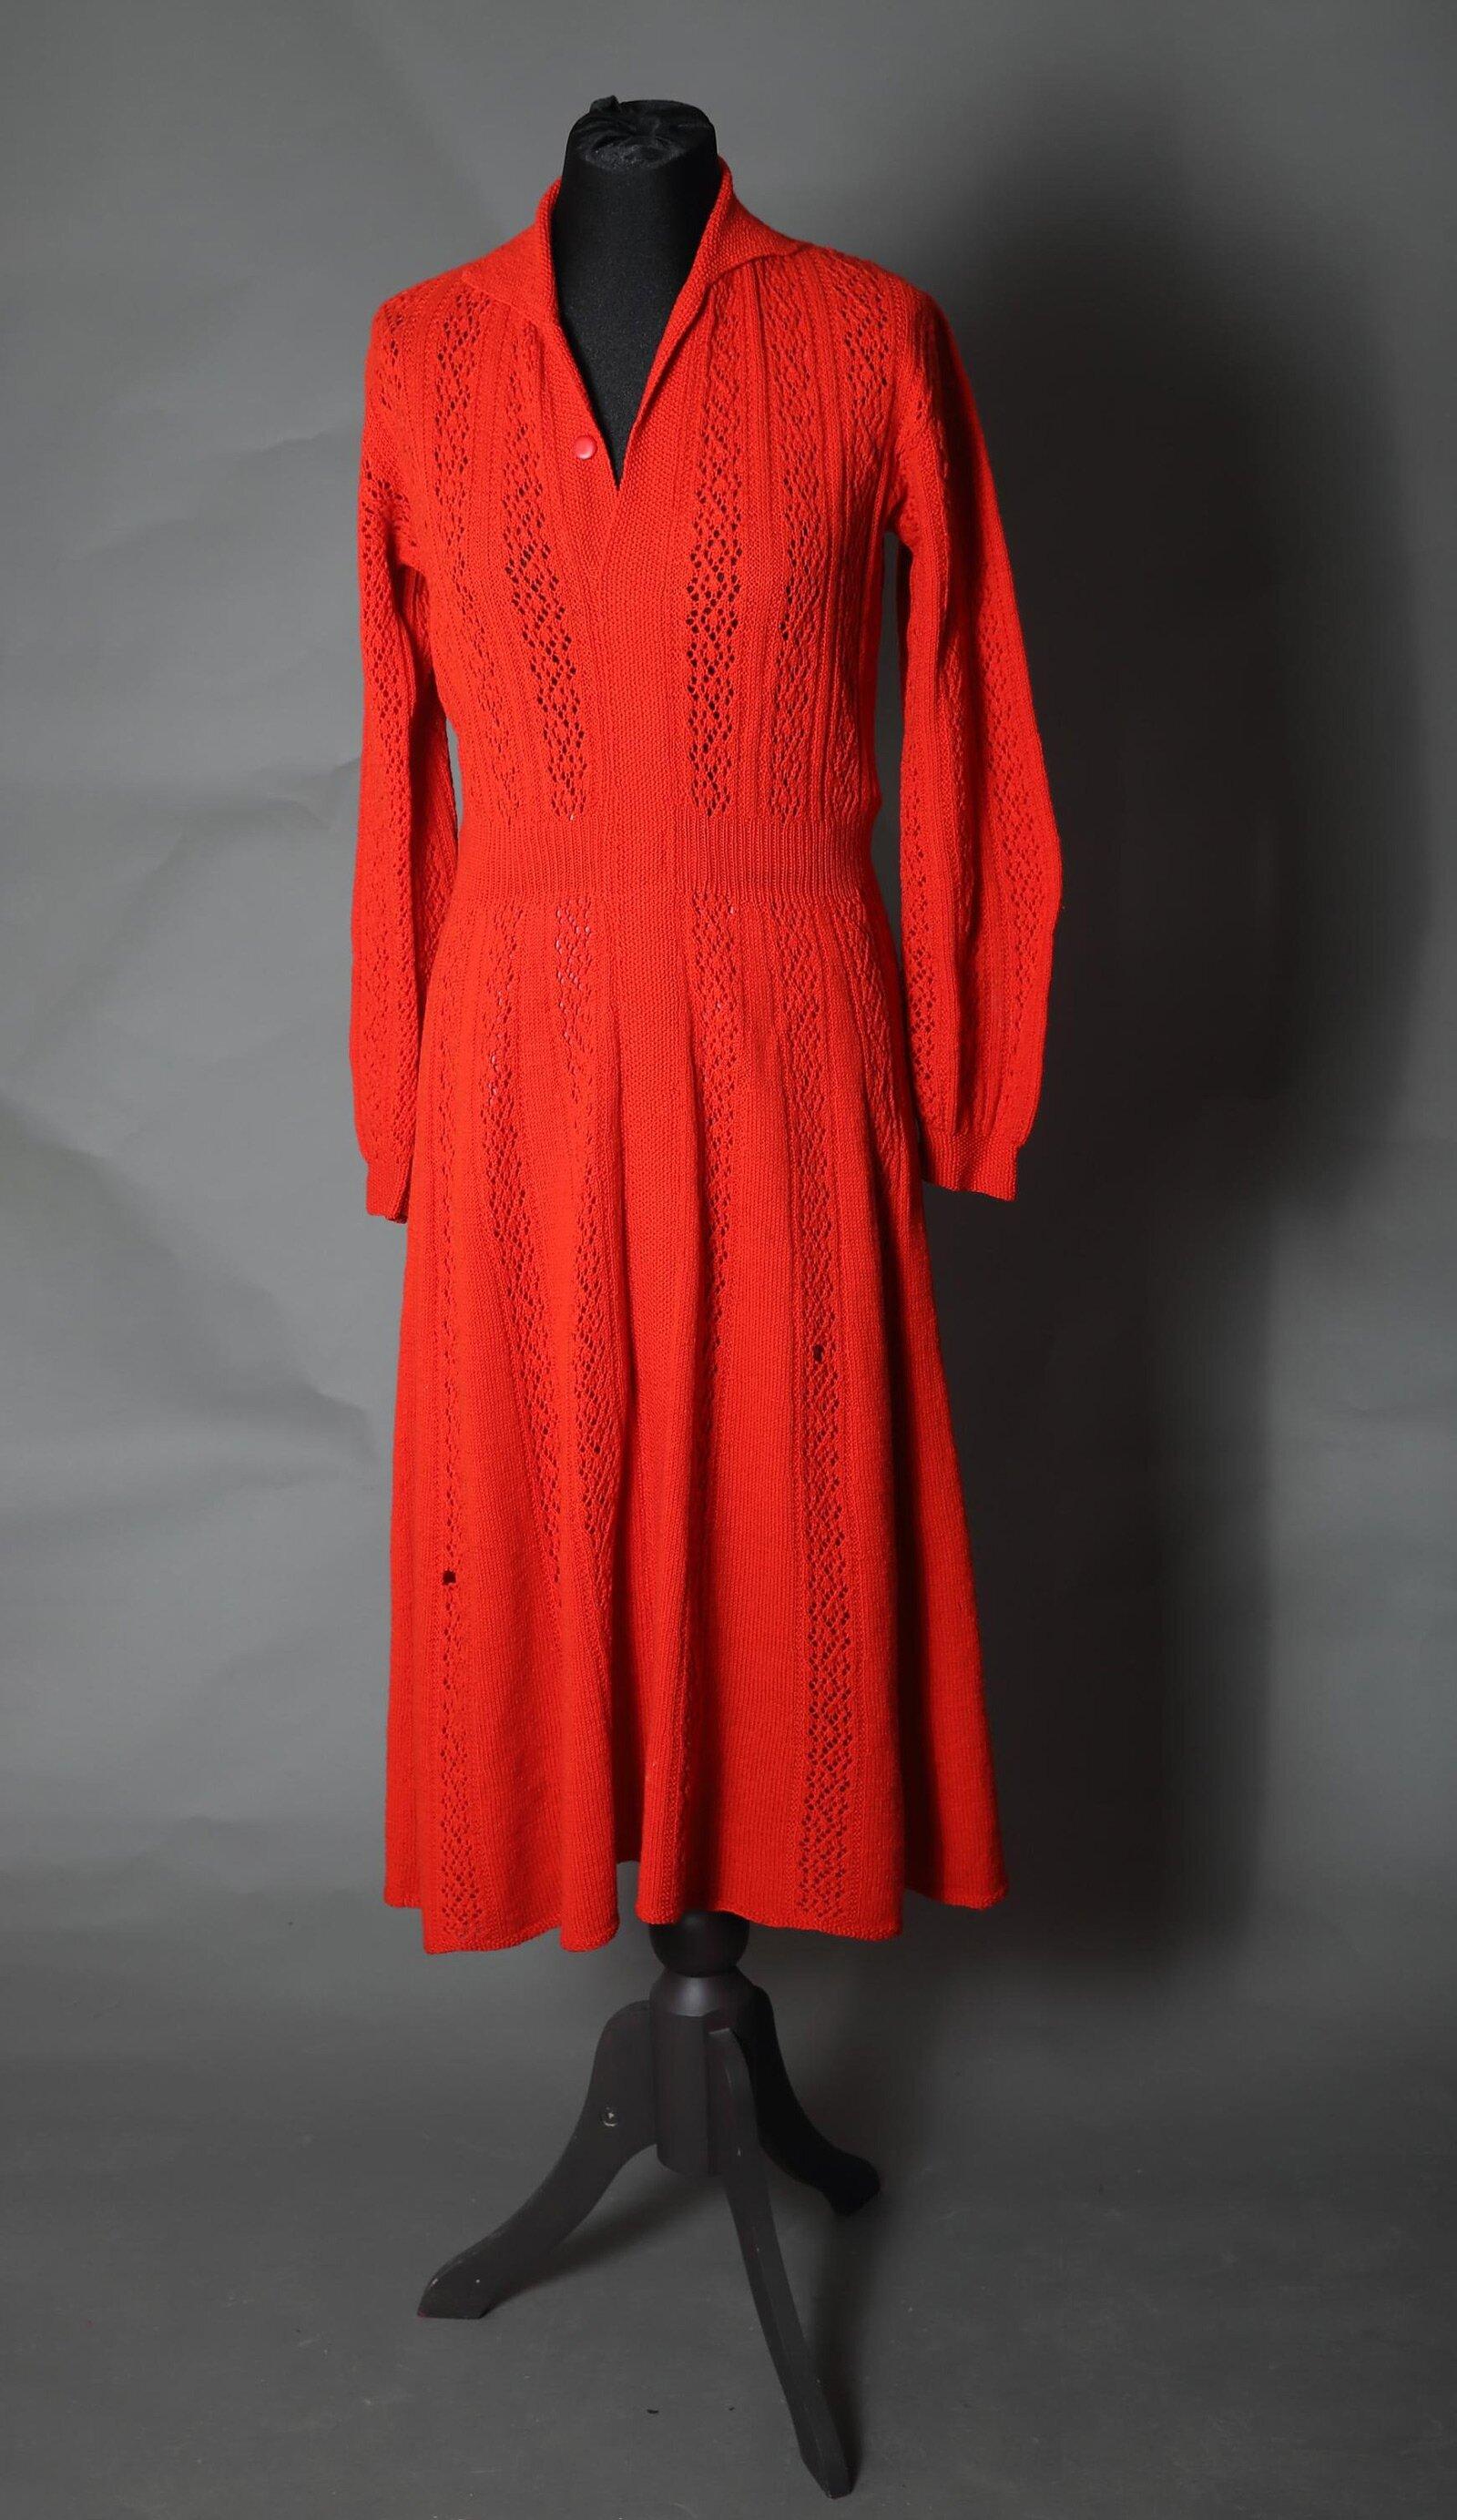 Платье из шерсти. Музей моды